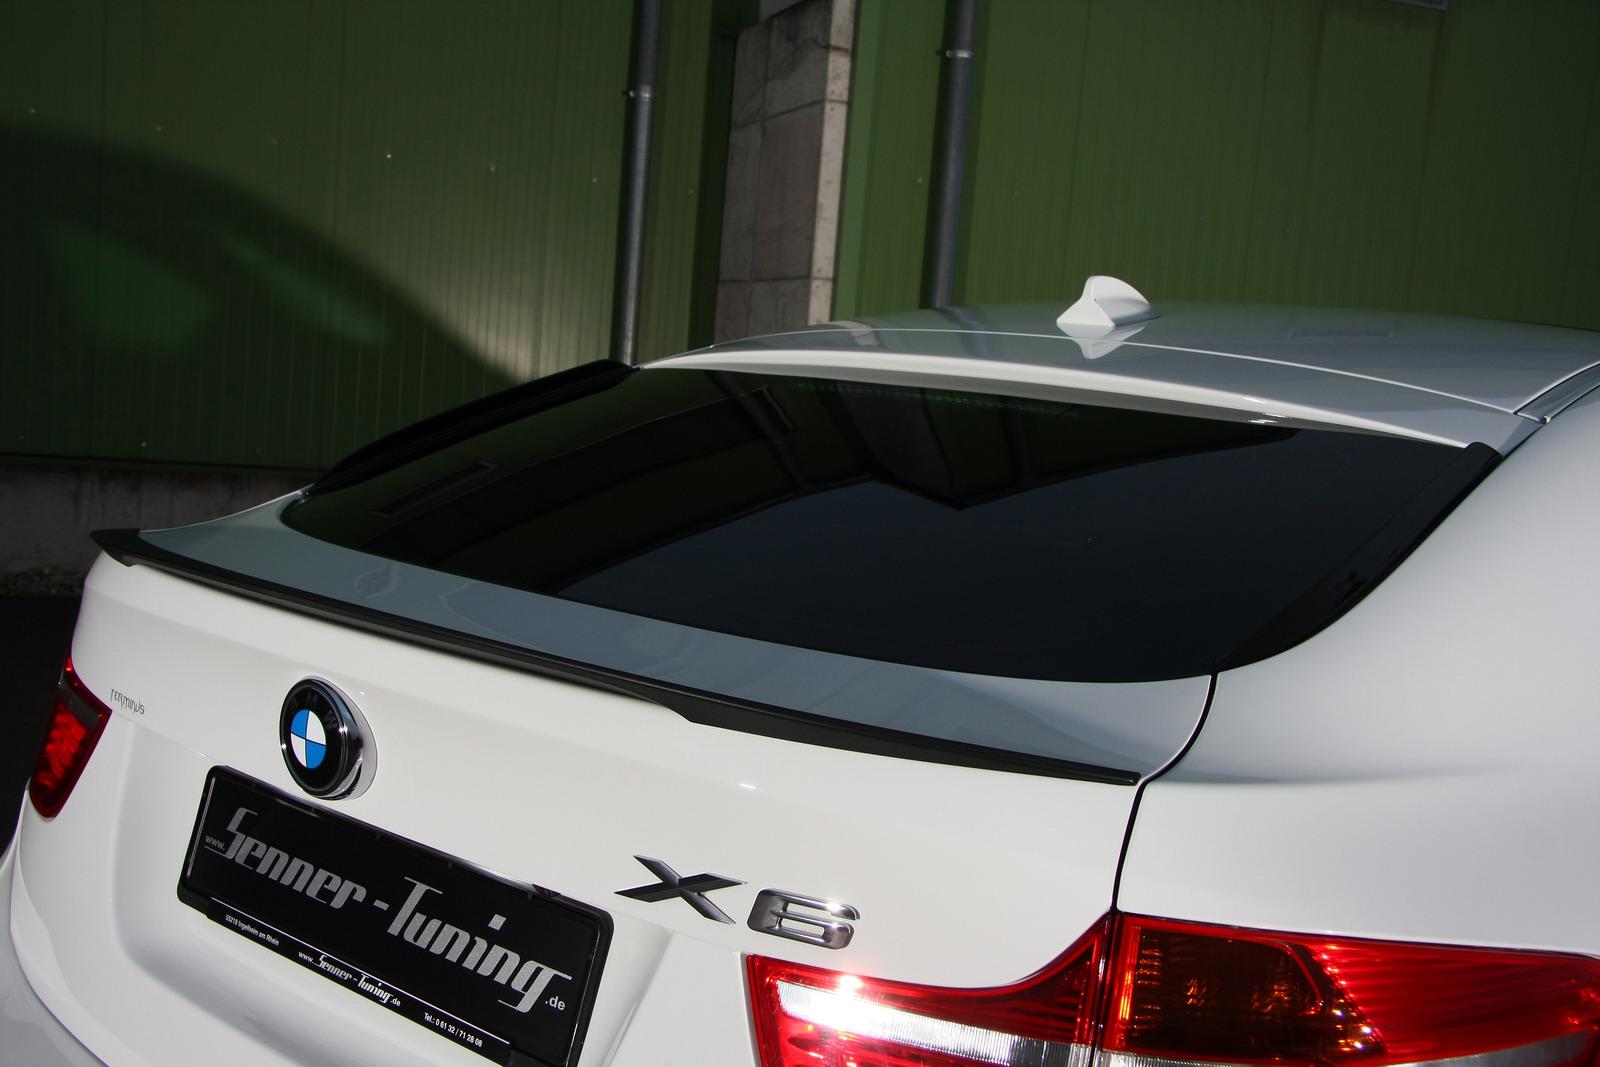 Naftové BMW X6 od Senner Tuning 4